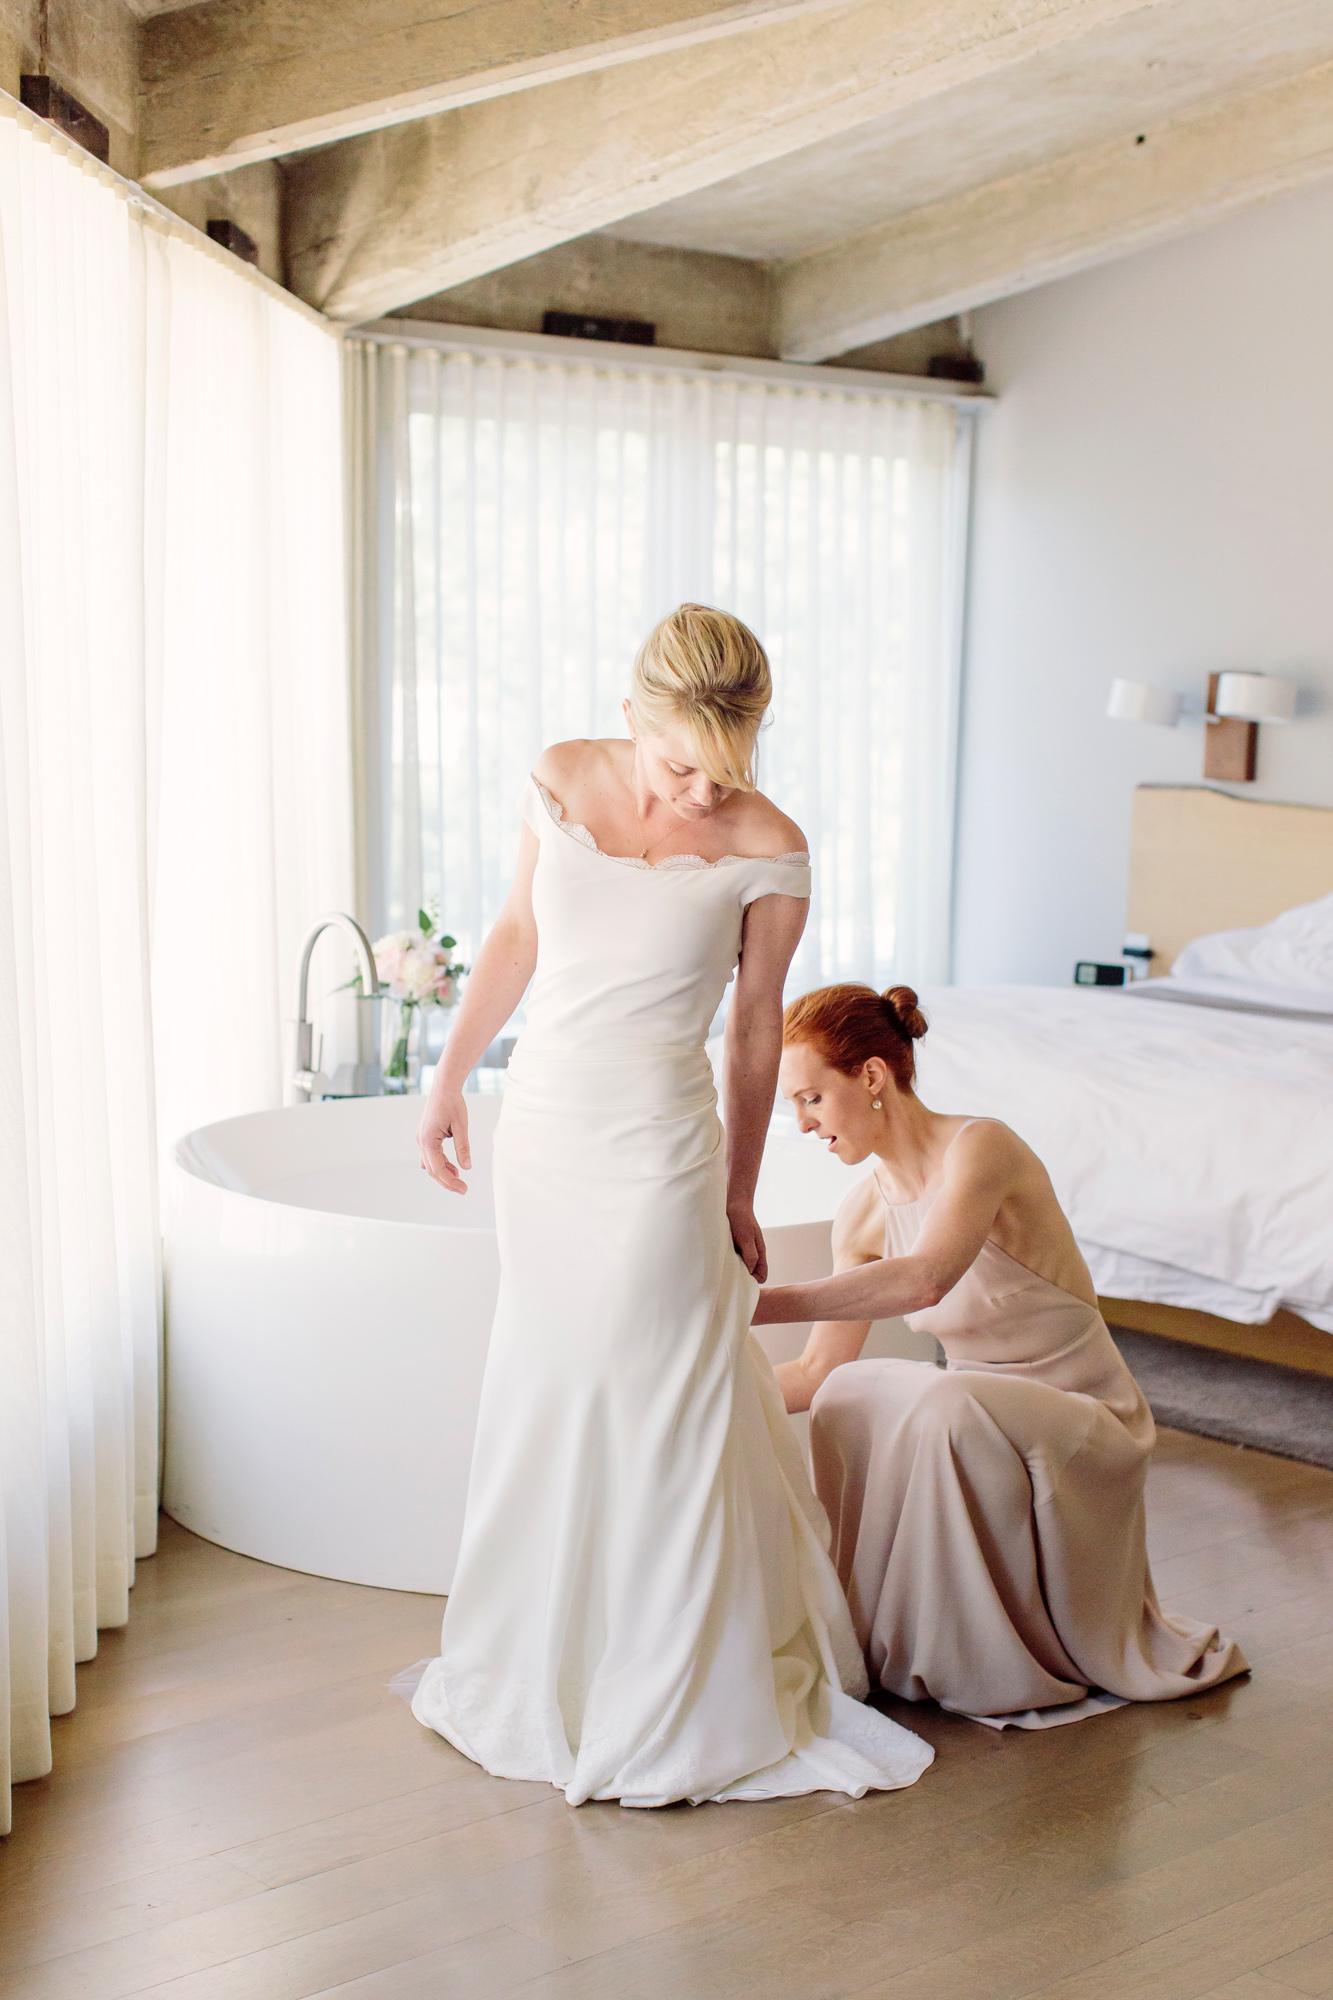 12_Rowan_Brian_The_Roundhouse_Wedding_Beacon_NY_Tanya_Salazar_Photography_053.jpg